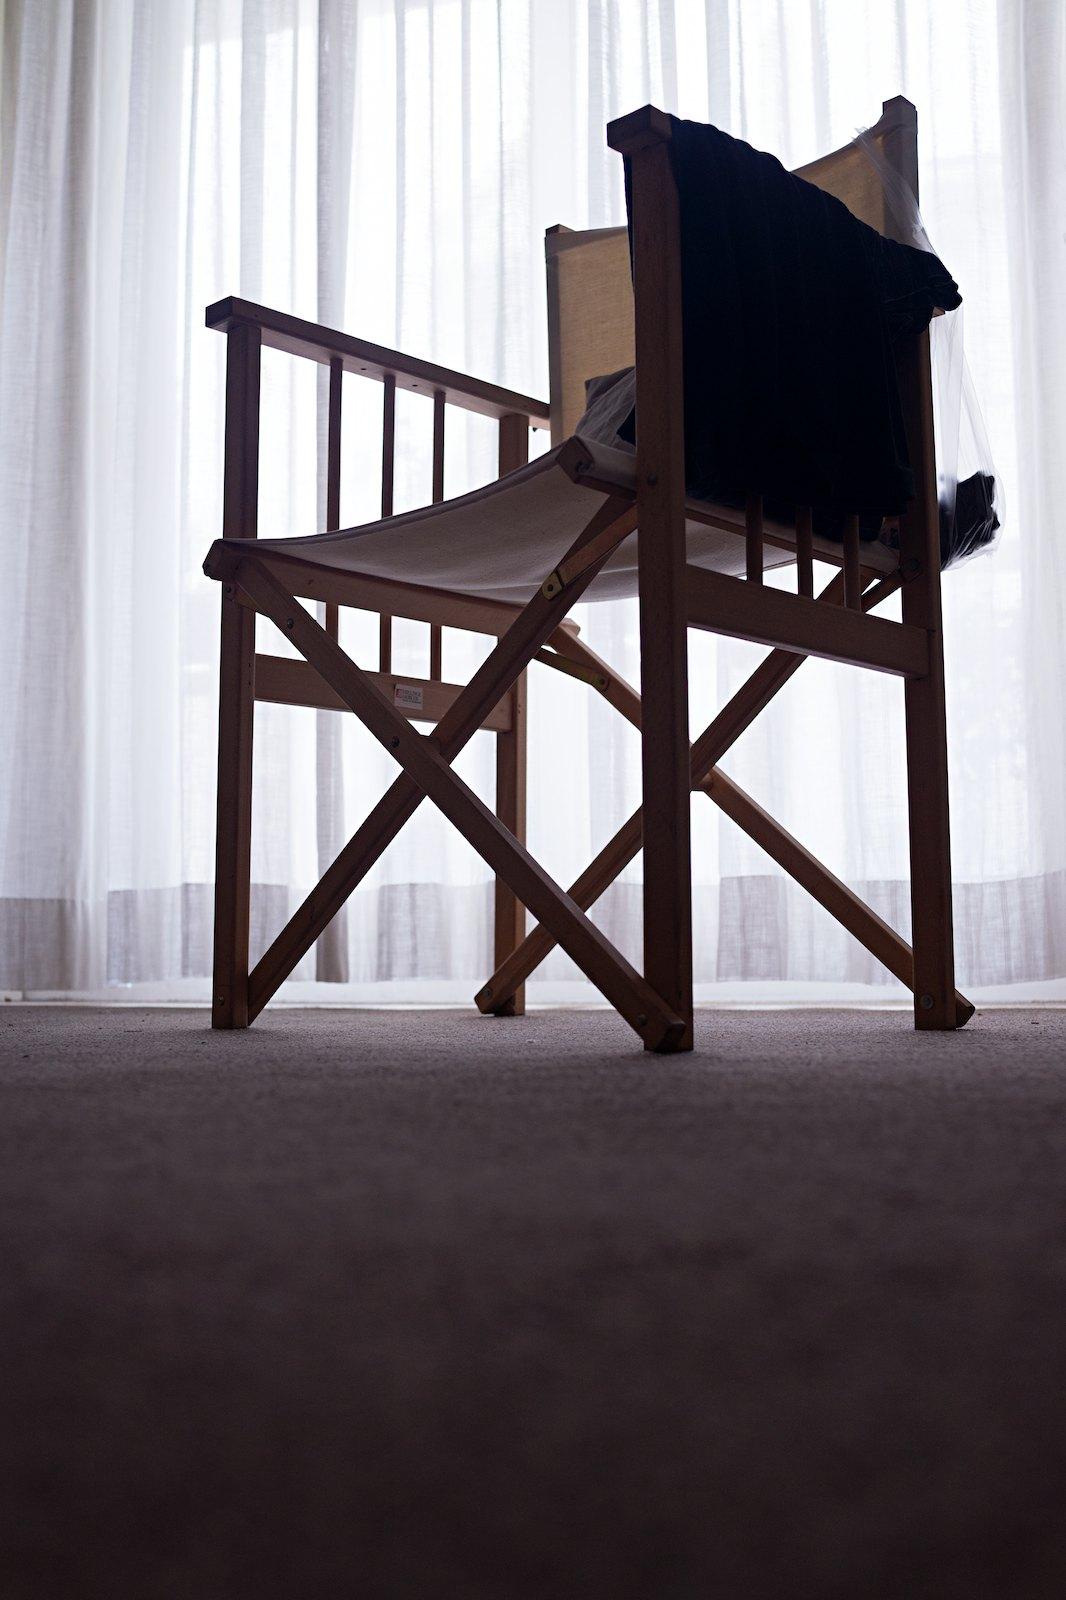 Chair, 2018/2019. Archival inkjet print, 60 x 39,5 cm. Ed. 5 + 1AP